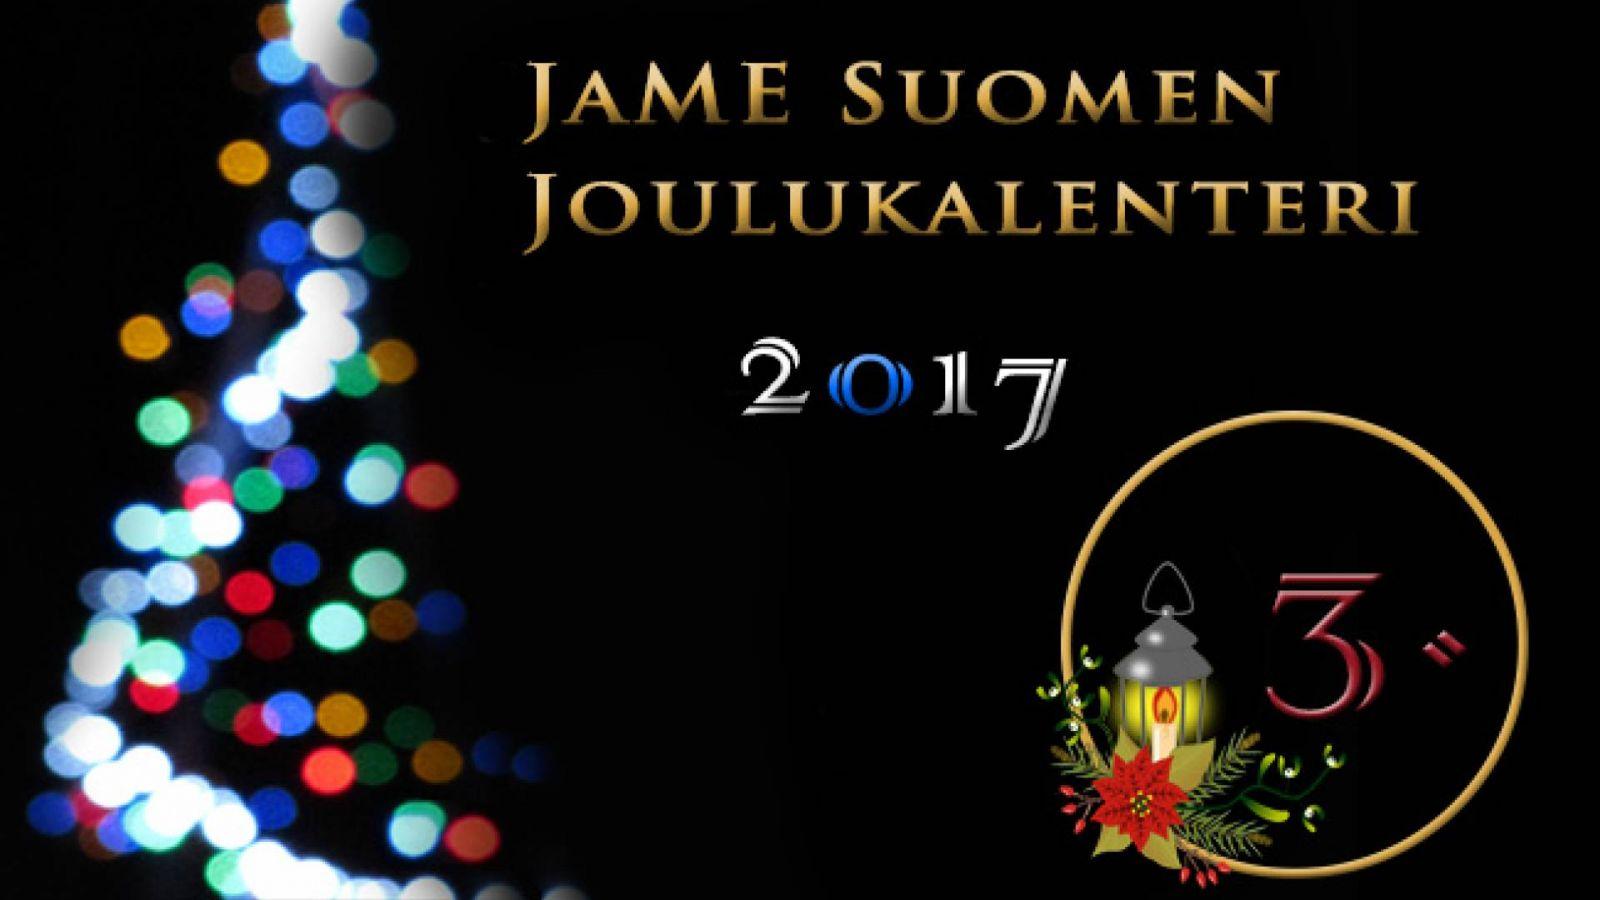 JaME Suomen joulukalenterin 3. luukku © Nipsu